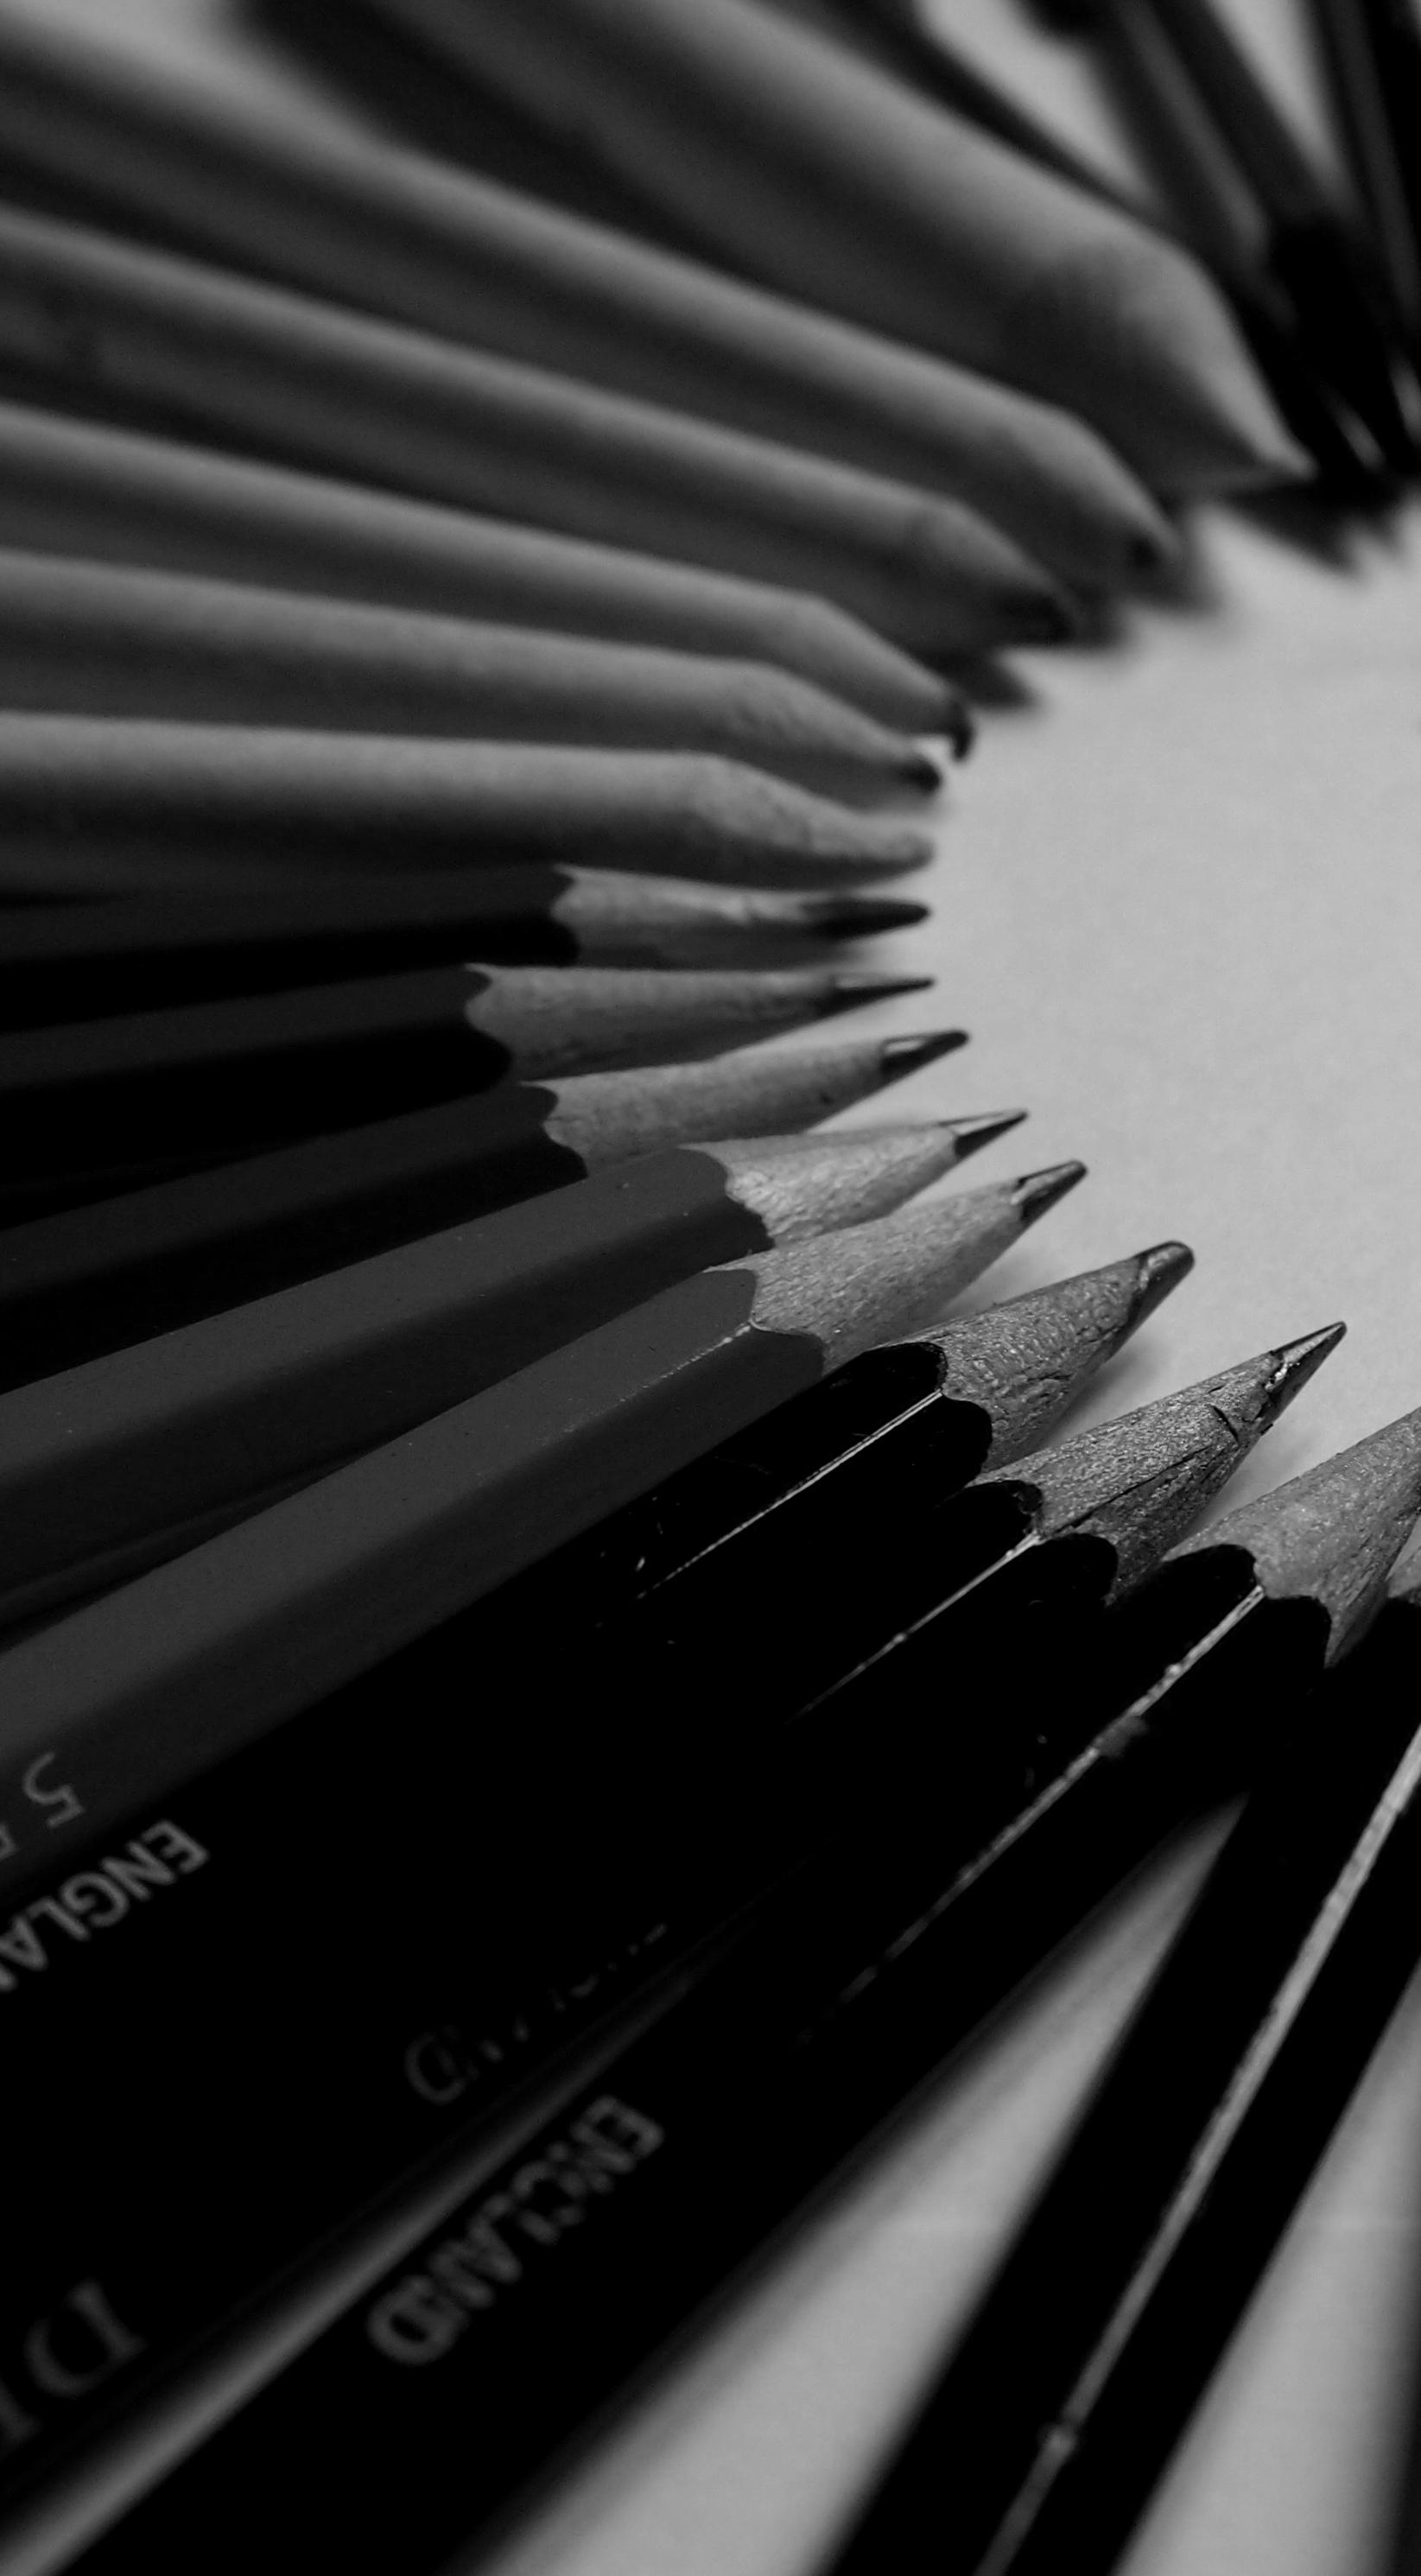 Fond crayons - Christophe Moreau